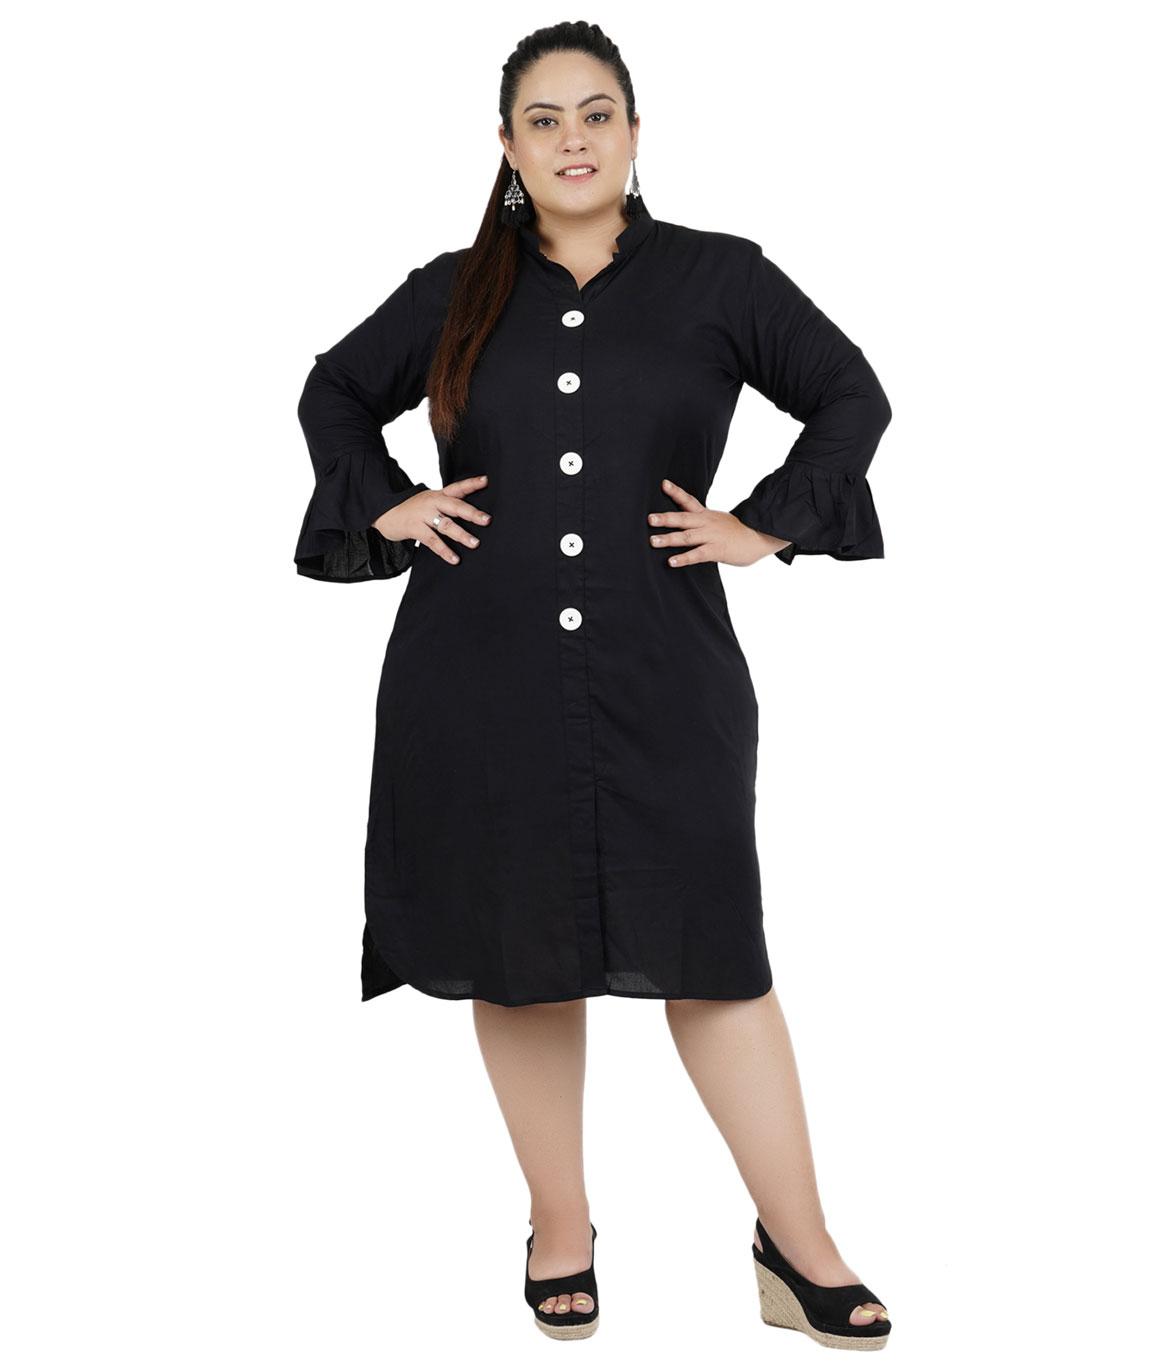 FAZZN Rayon Dresses For Women`s(Black)